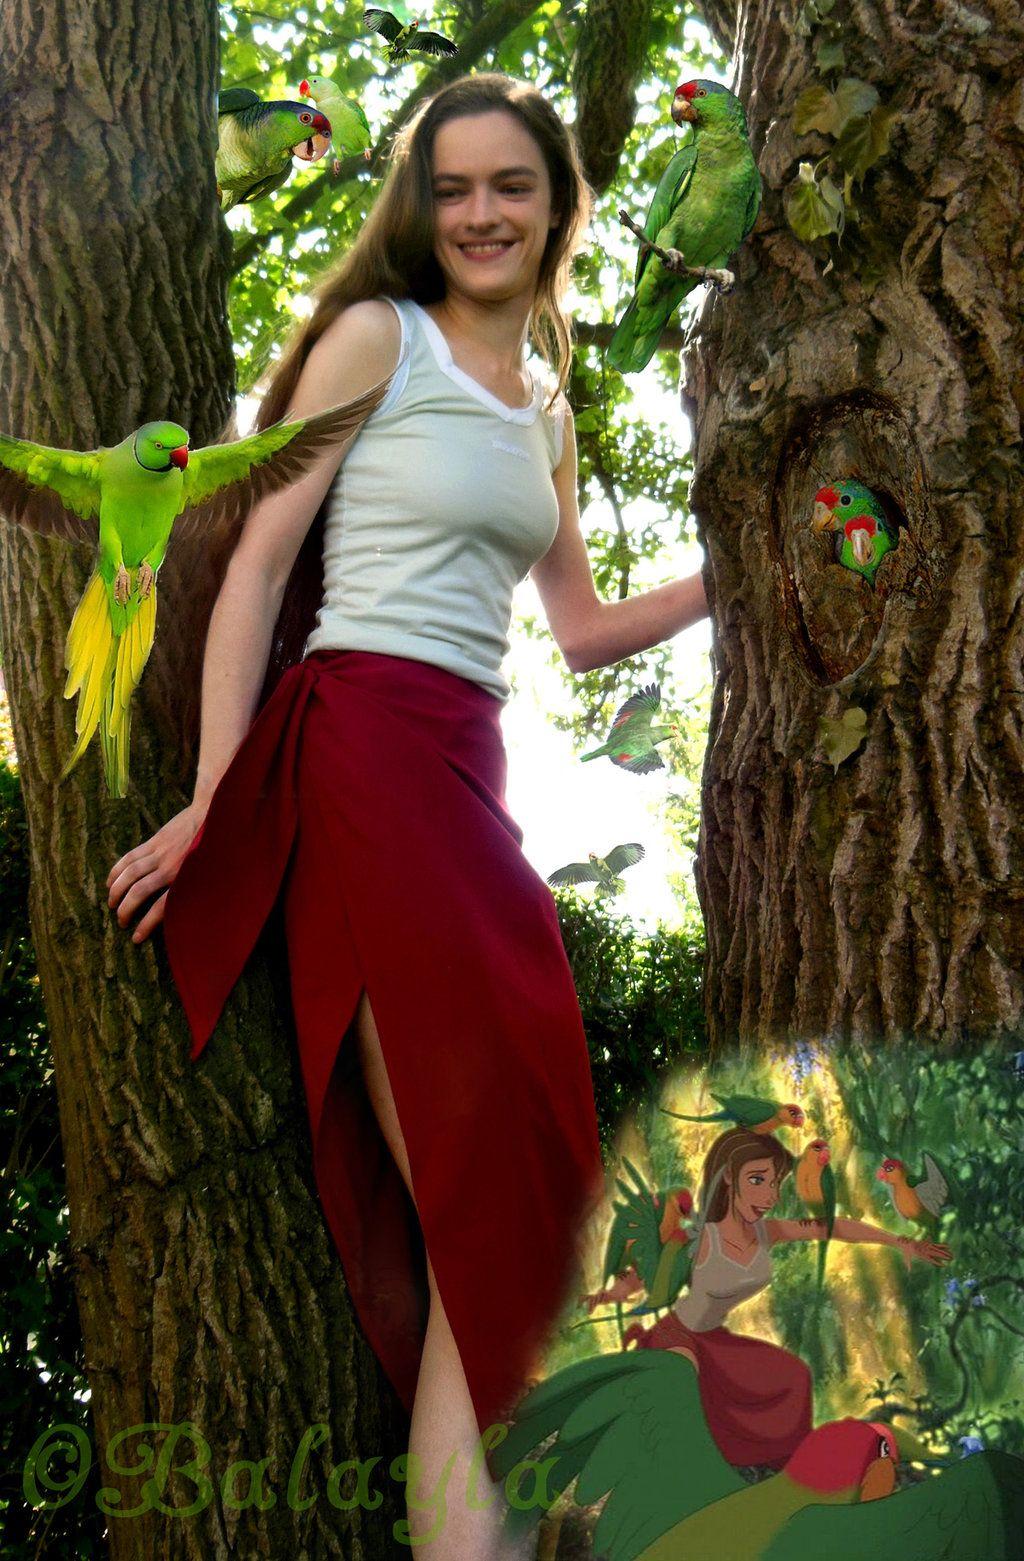 [Cosplay - Disney - Tarzan] Jane Porter by mene.deviantart.com on @DeviantArt  sc 1 st  Pinterest & Cosplay - Disney - Tarzan] Jane Porter by mene.deviantart.com on ...